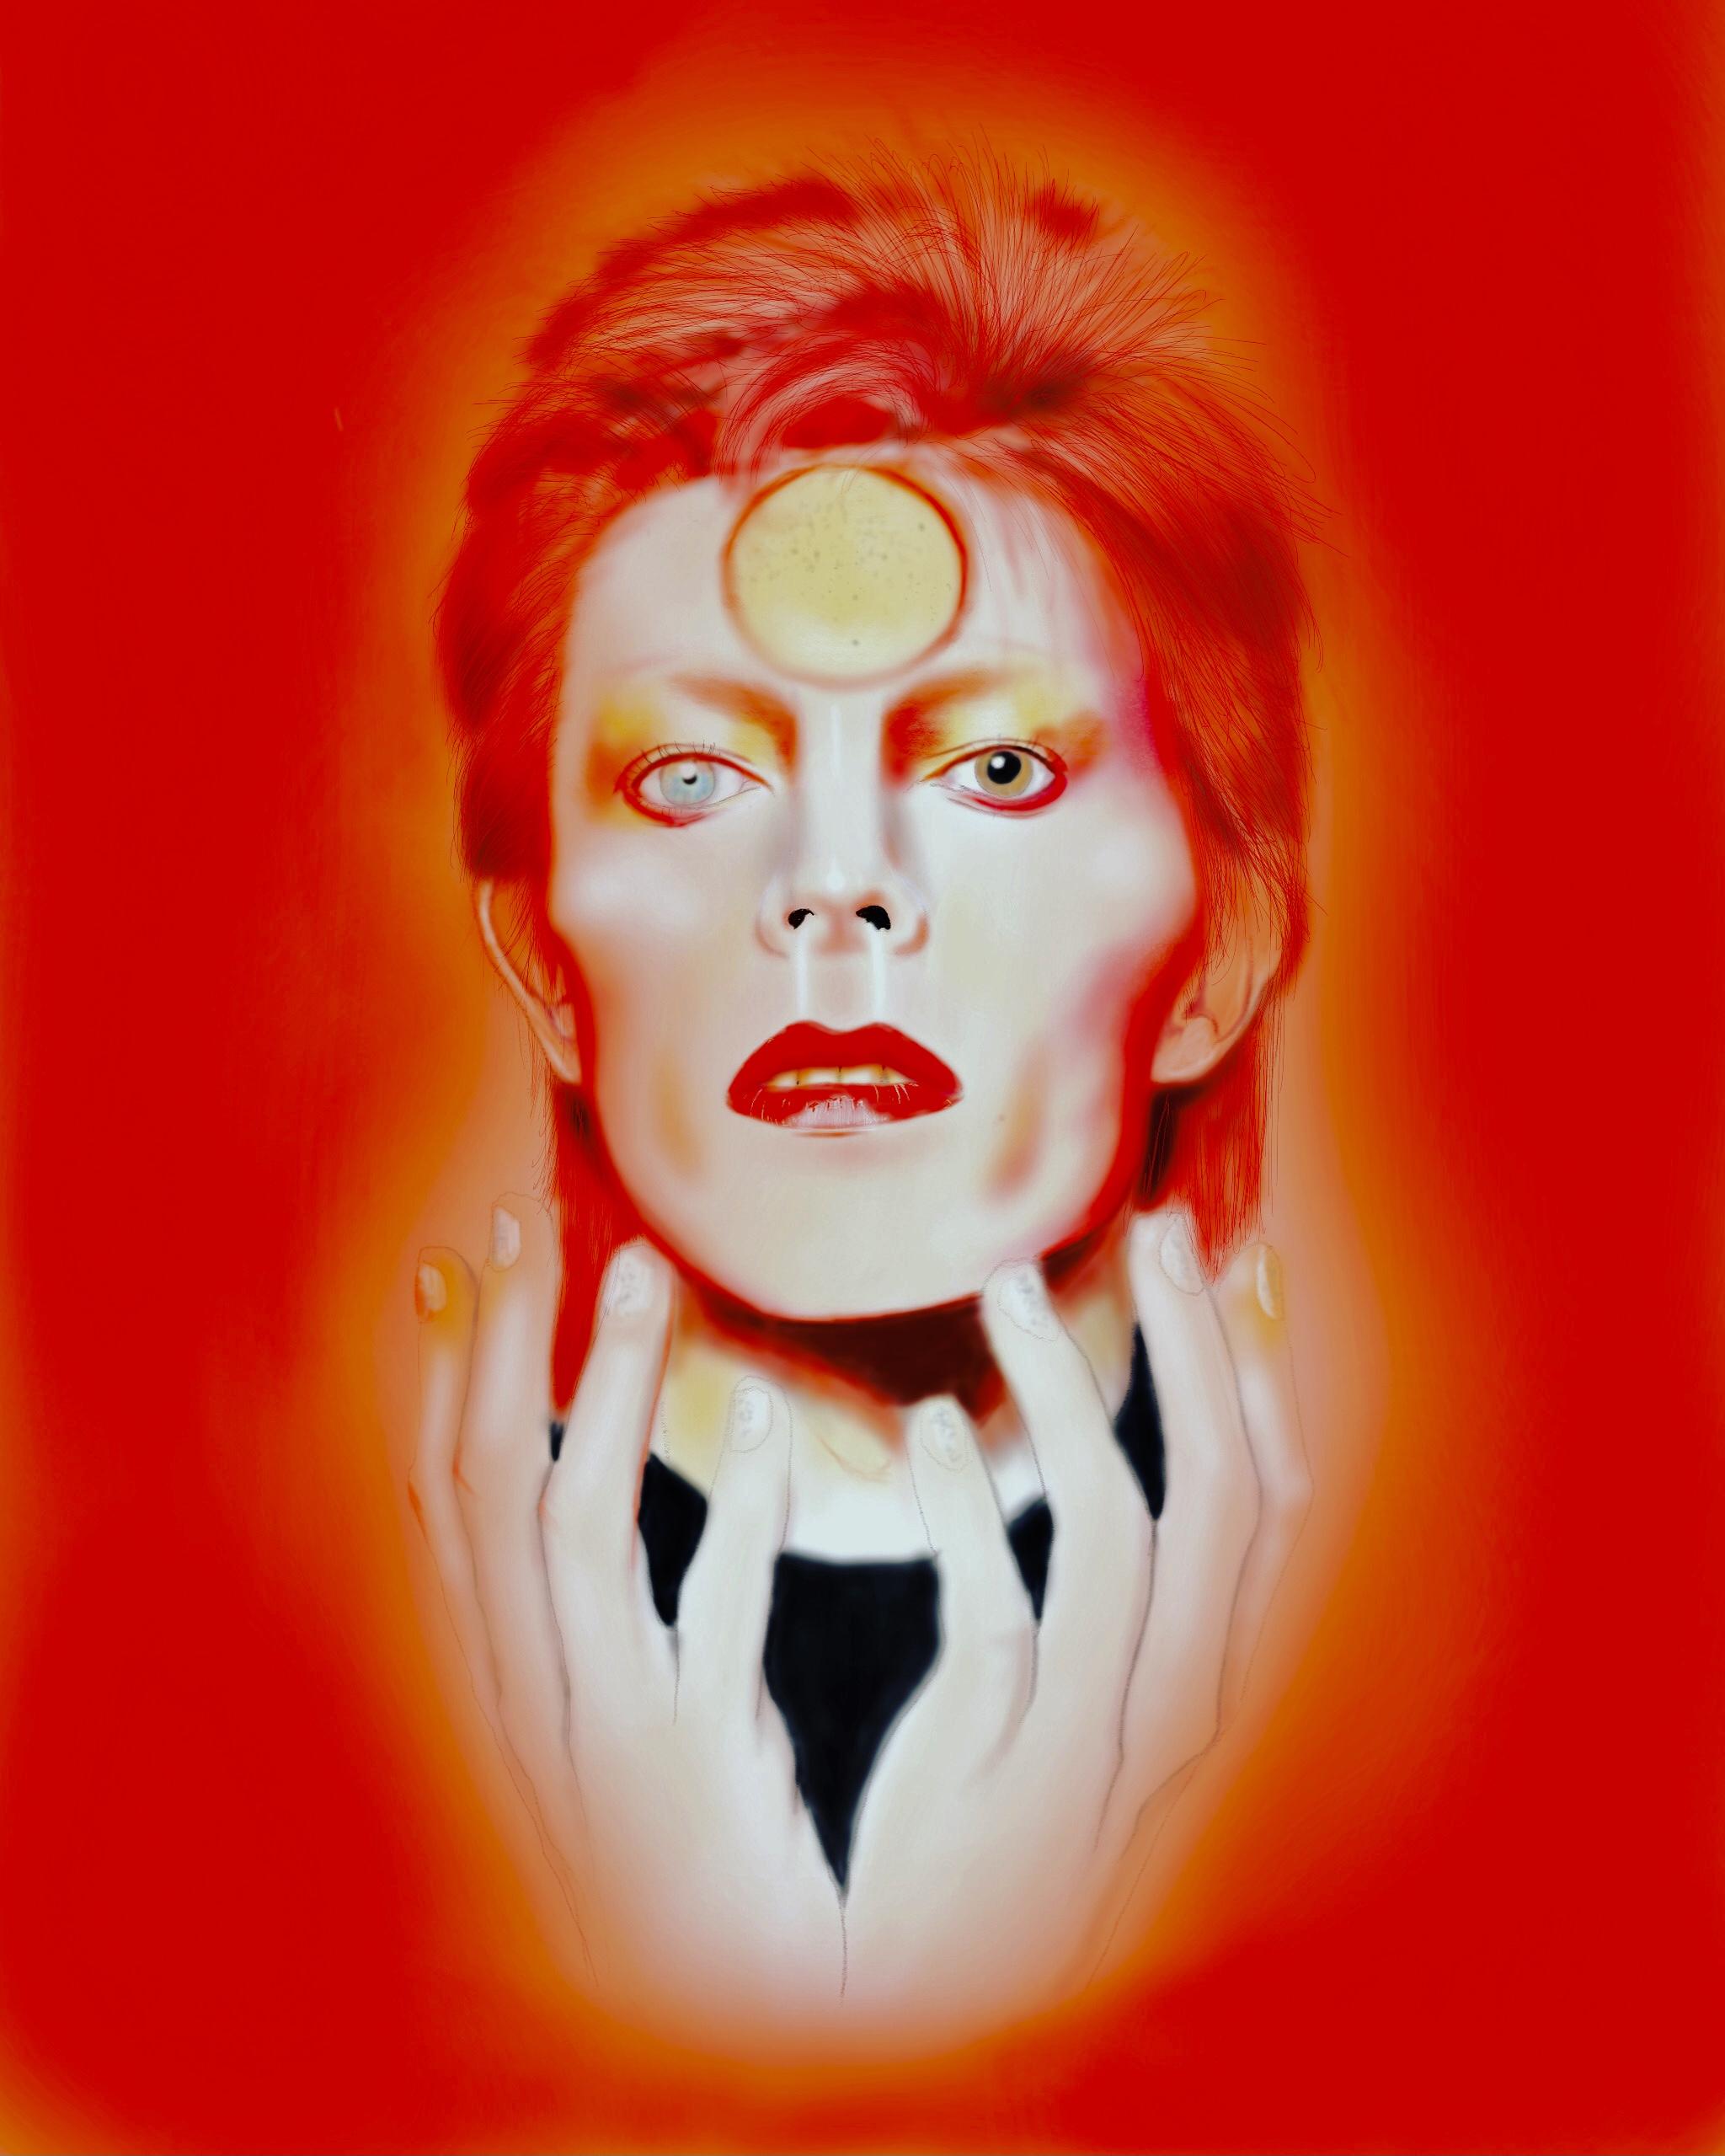 David Bowie- Ziggy Stardust, Emilia Wrocenska <br>2732 x 2048 px <br> Digital art